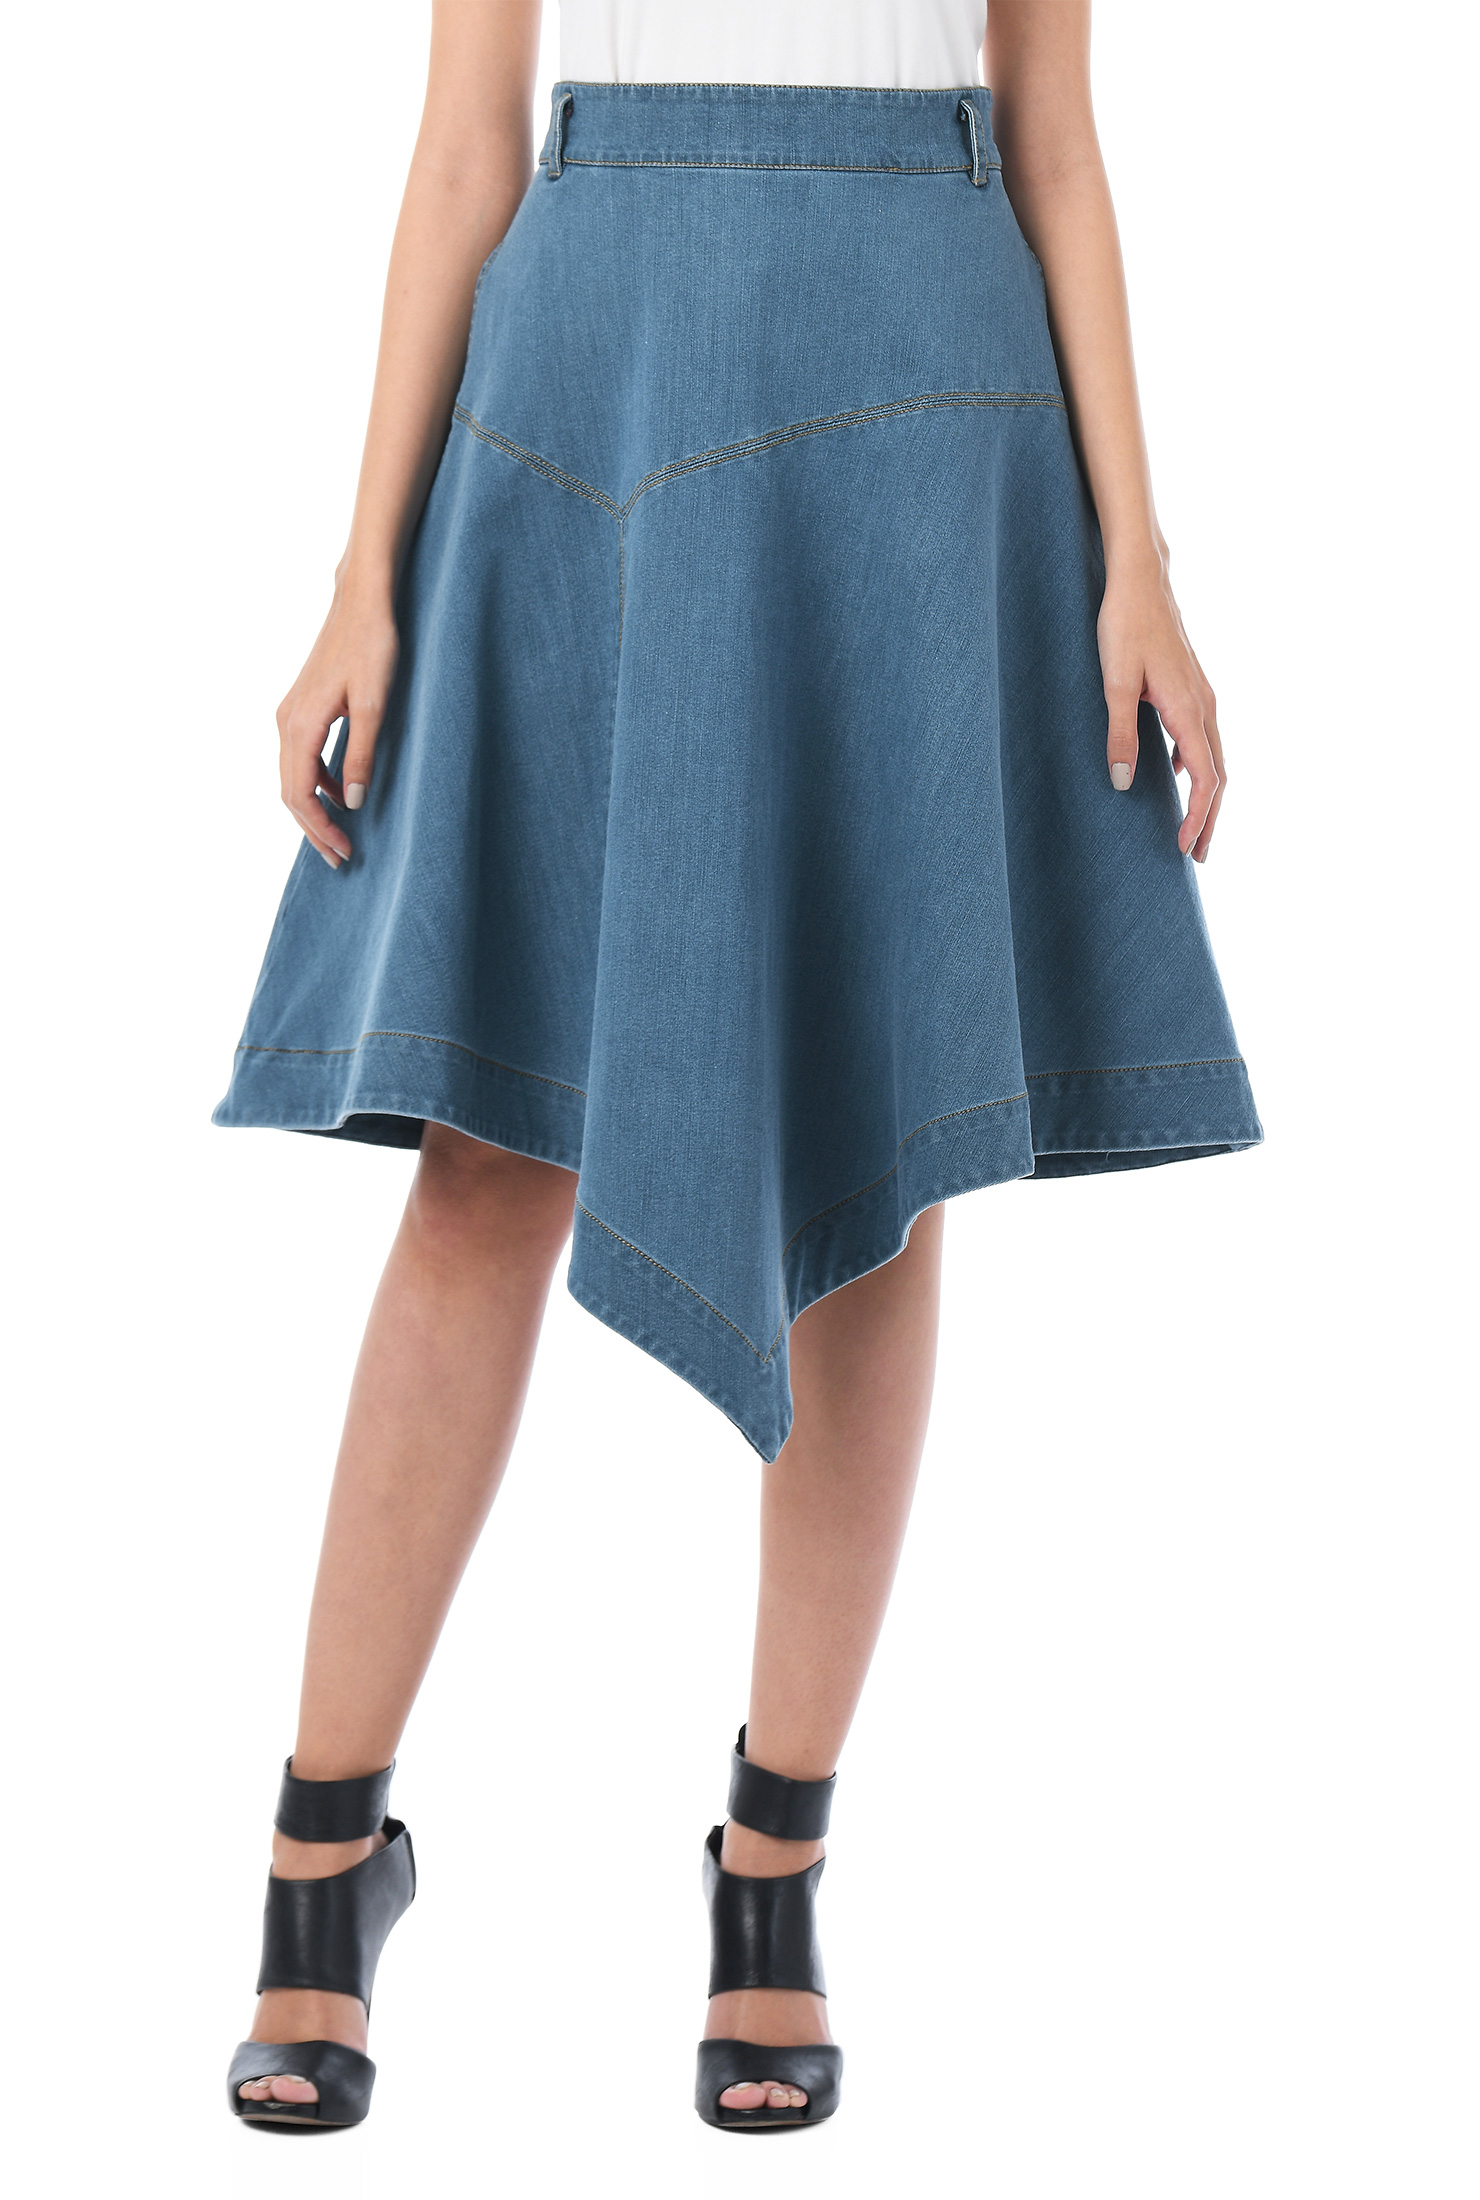 e206c29e50 Back zip skirts, banded waist skirts, Cotton/polyester/spandex skirts,